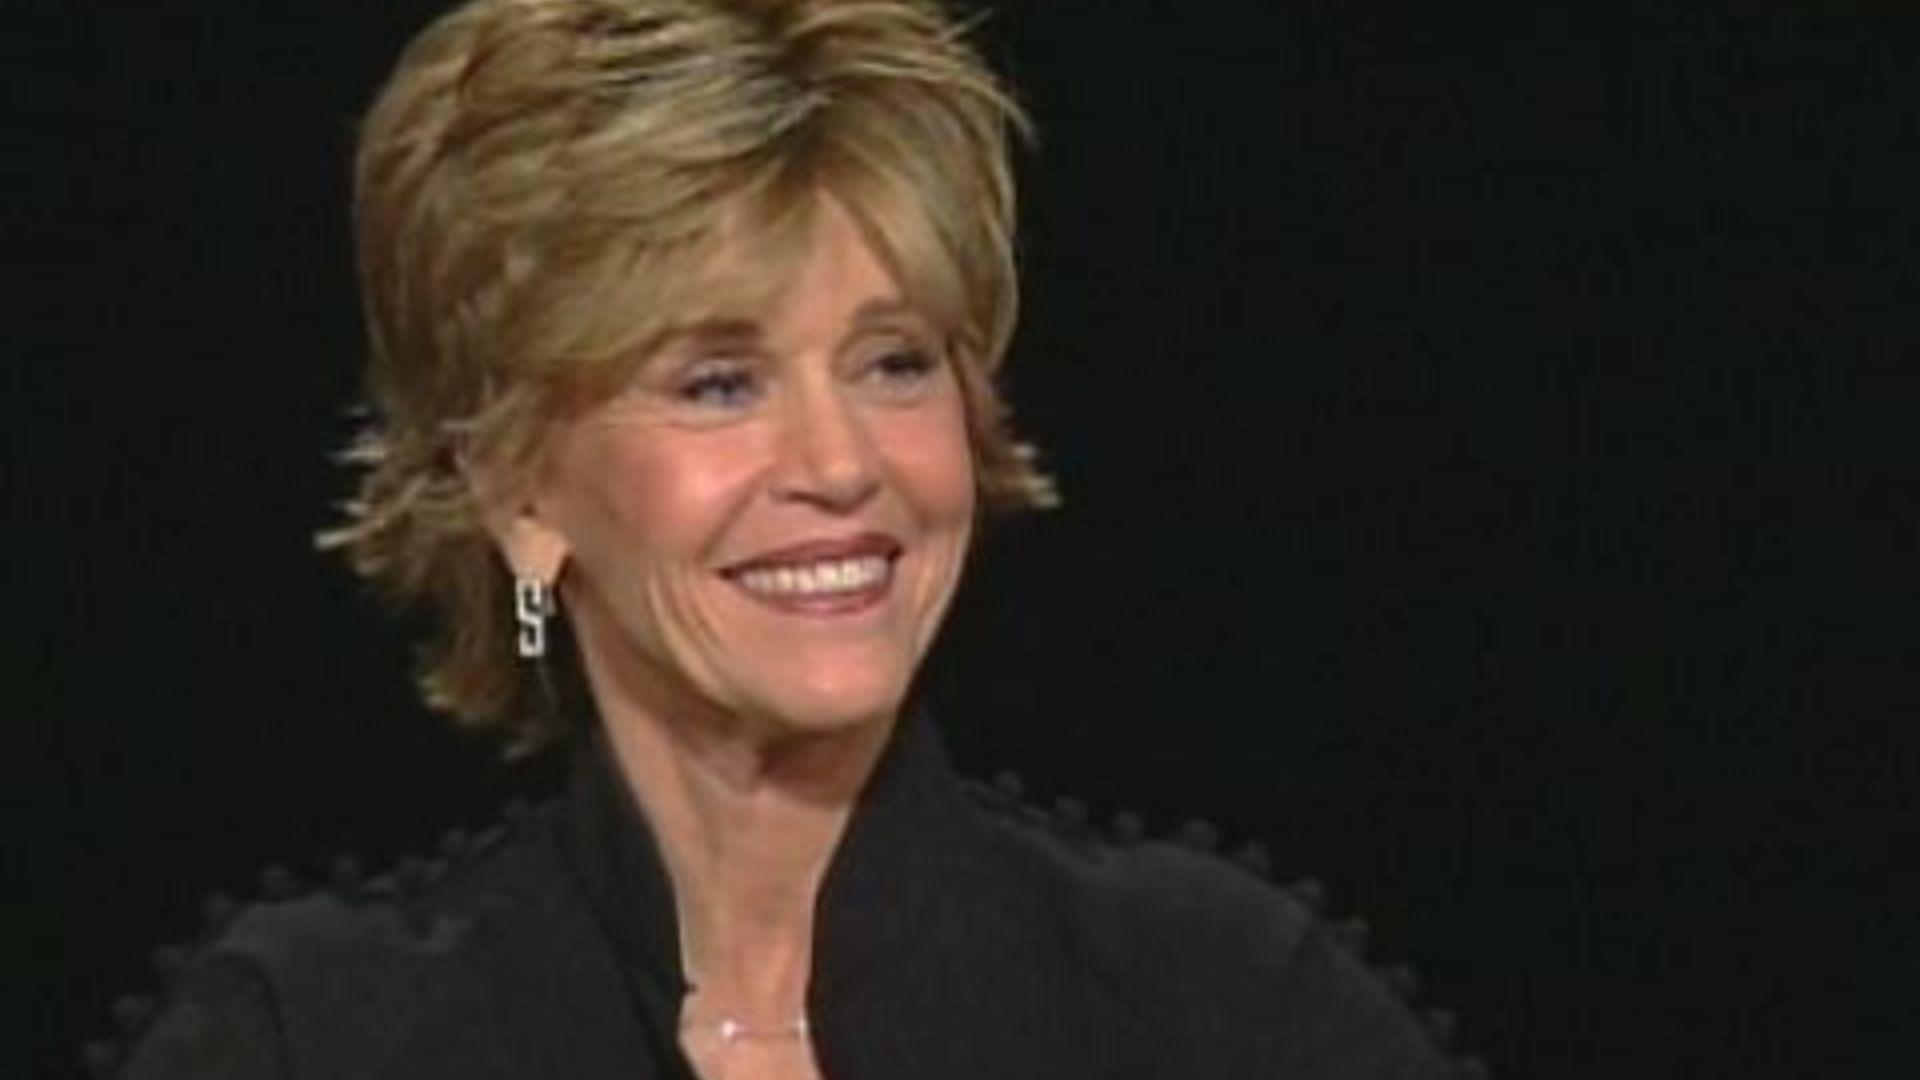 Watch Sigourney Weaver video